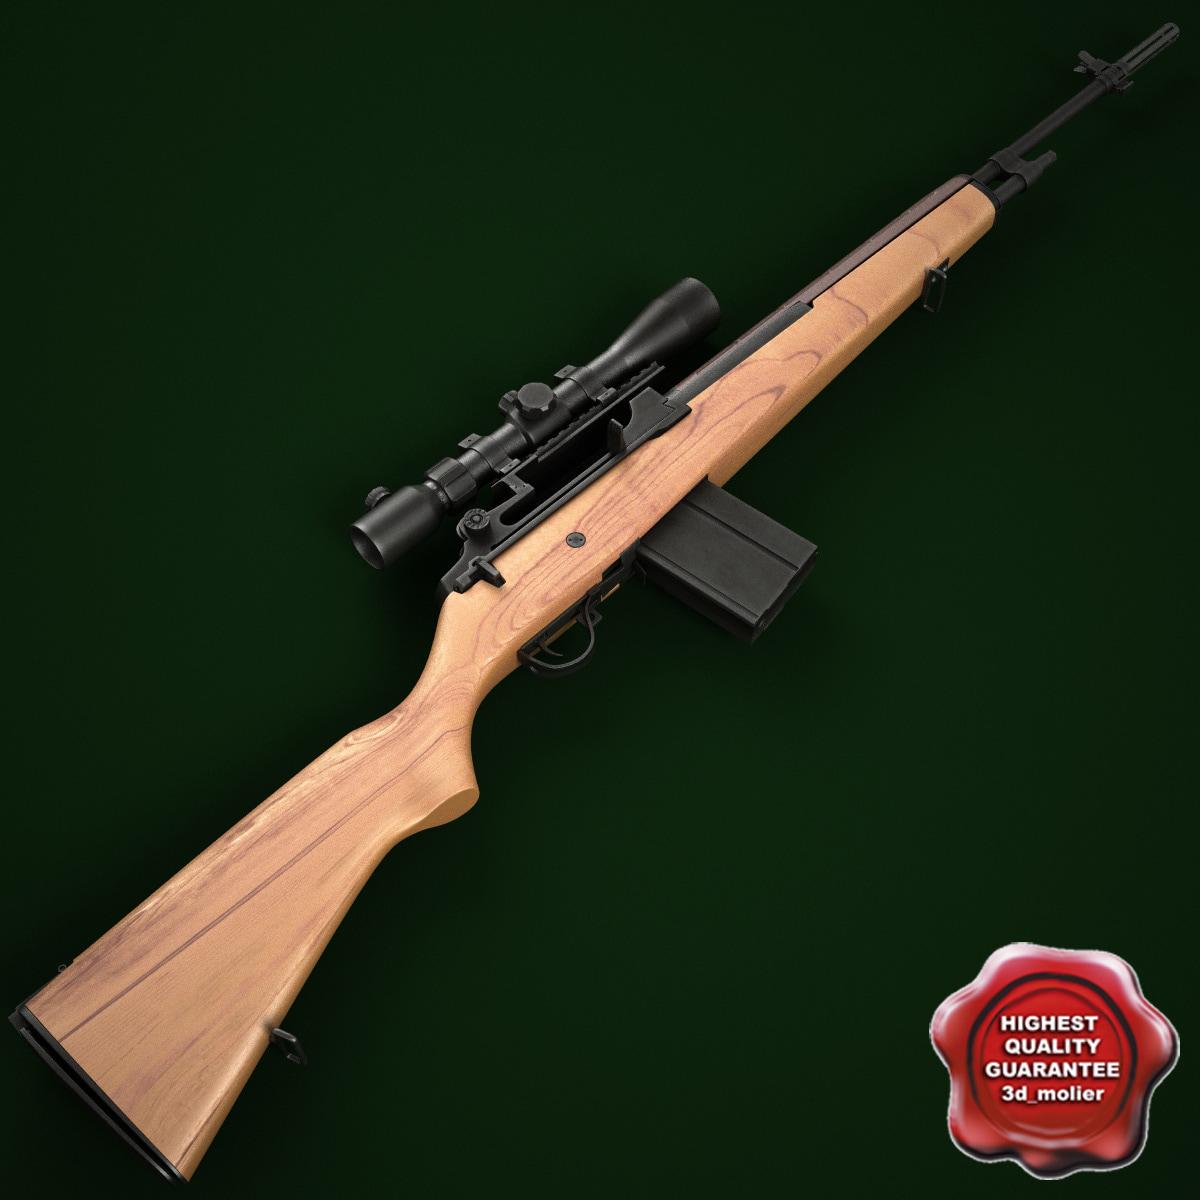 M14_Rifle_with_Optical_Scope_00.jpg